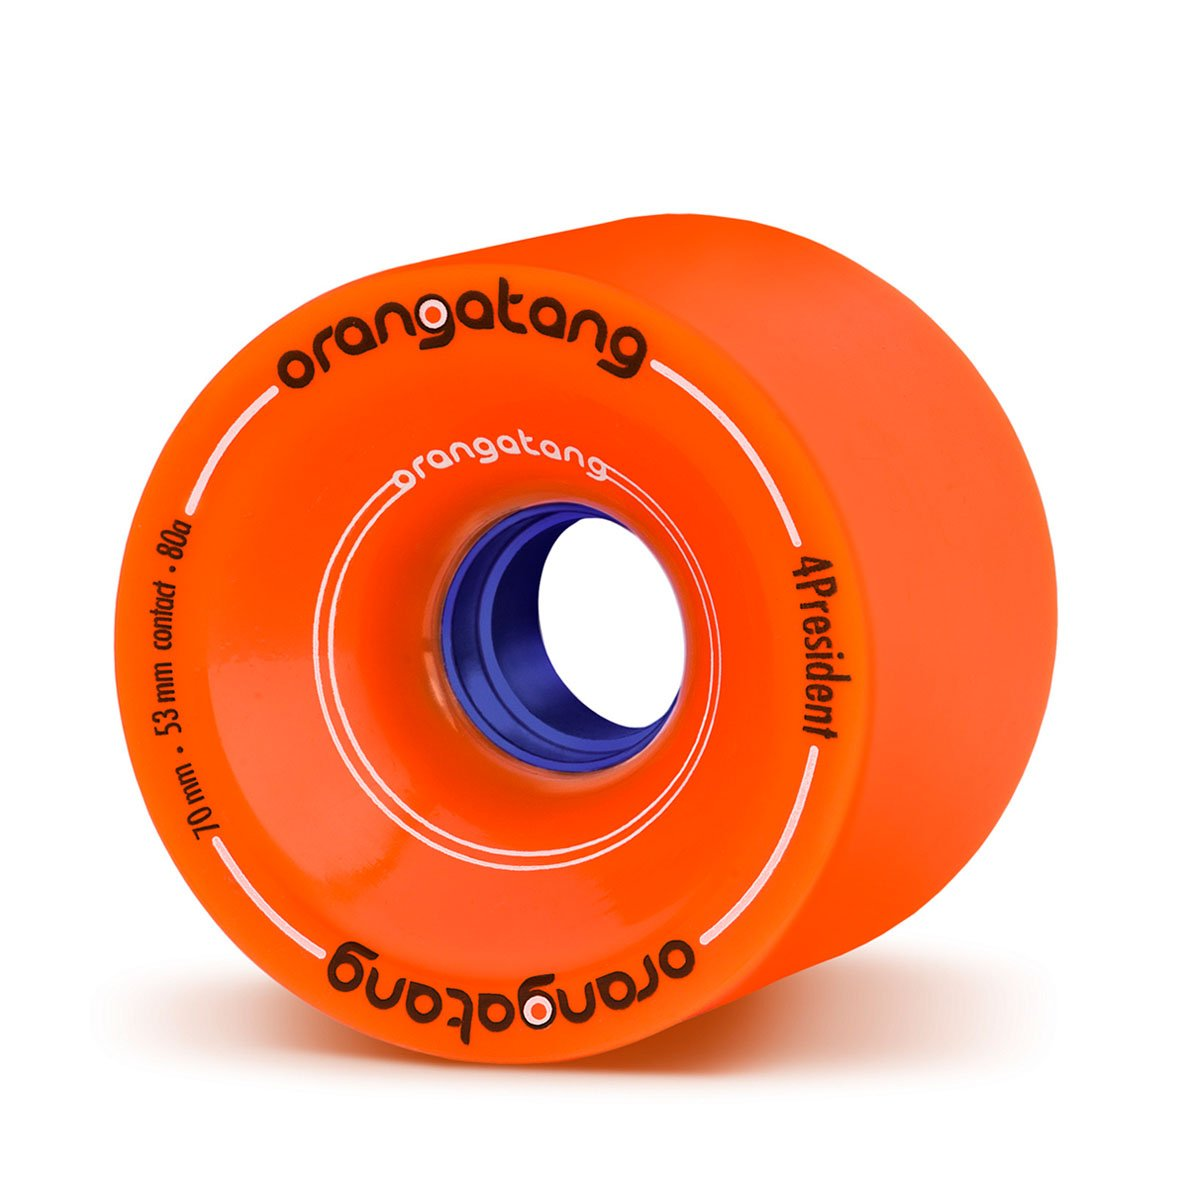 Orangatang 4 President 70 mm 80a Cruising Longboard Skateboard Wheels (Orange, Set of 4) by Orangatang